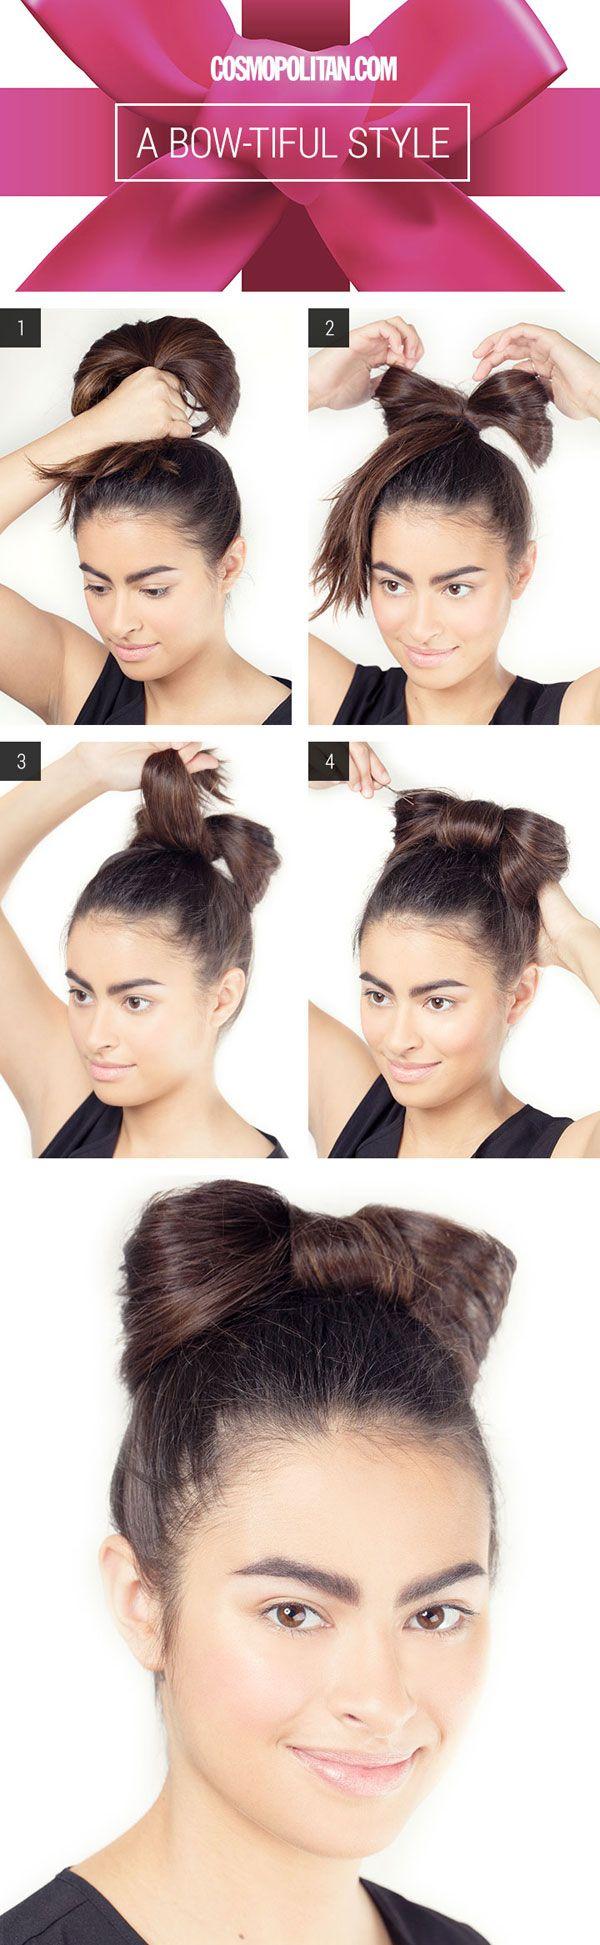 Hair Bow Style - Hair Bow How To - Seventeen